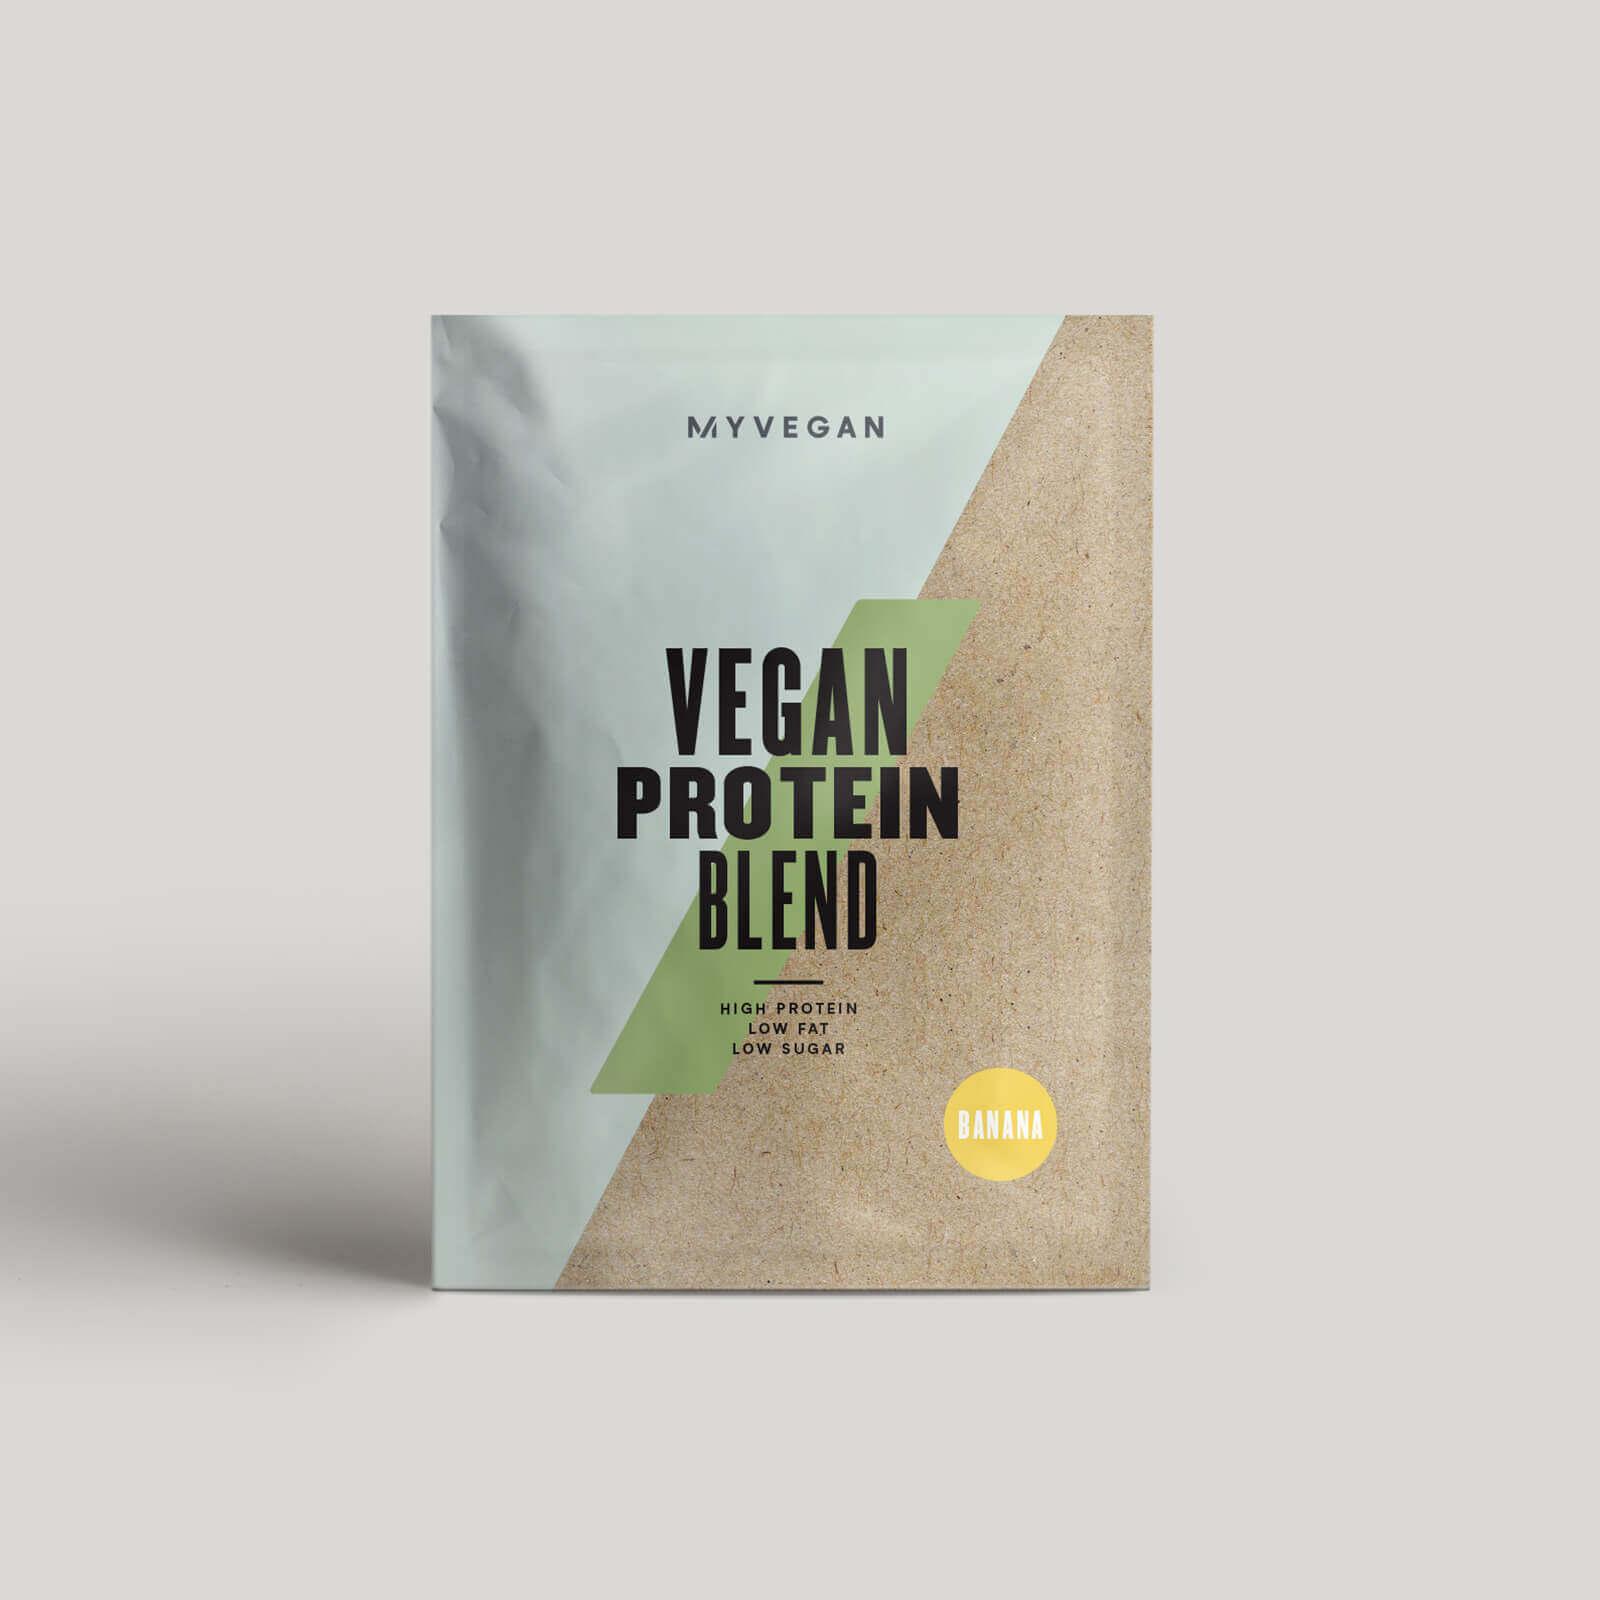 Myvegan Vegan Protein Blend (Sample) - Blueberry and Cinnamon